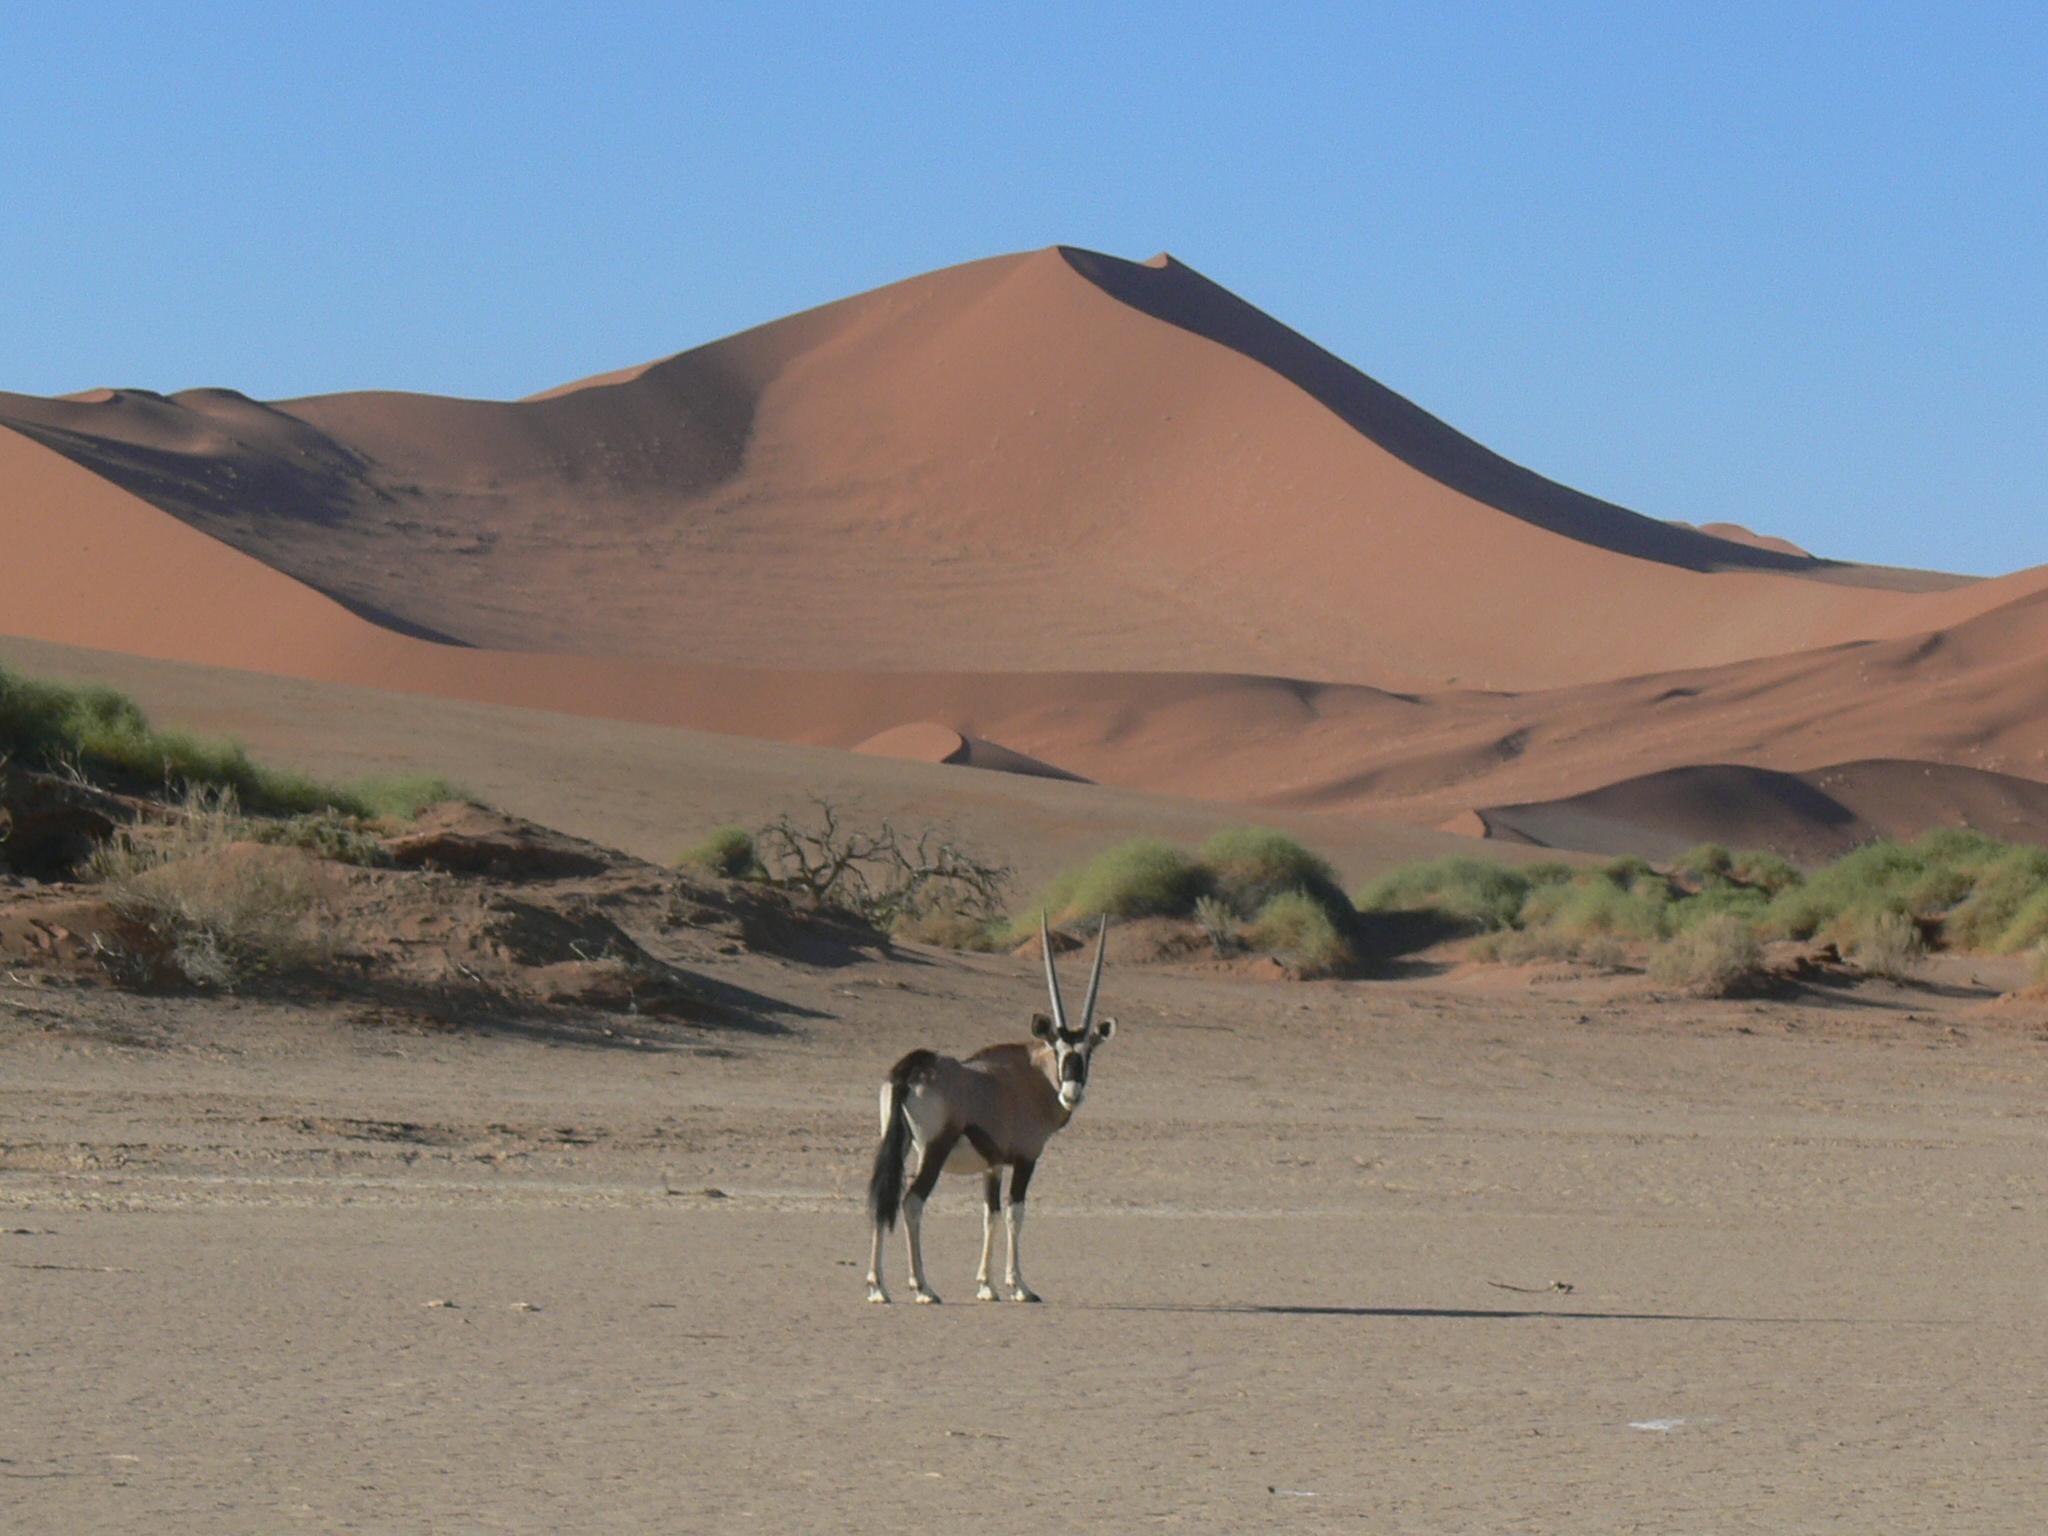 NAMIBIA LUXURY CAMPING SAFARI